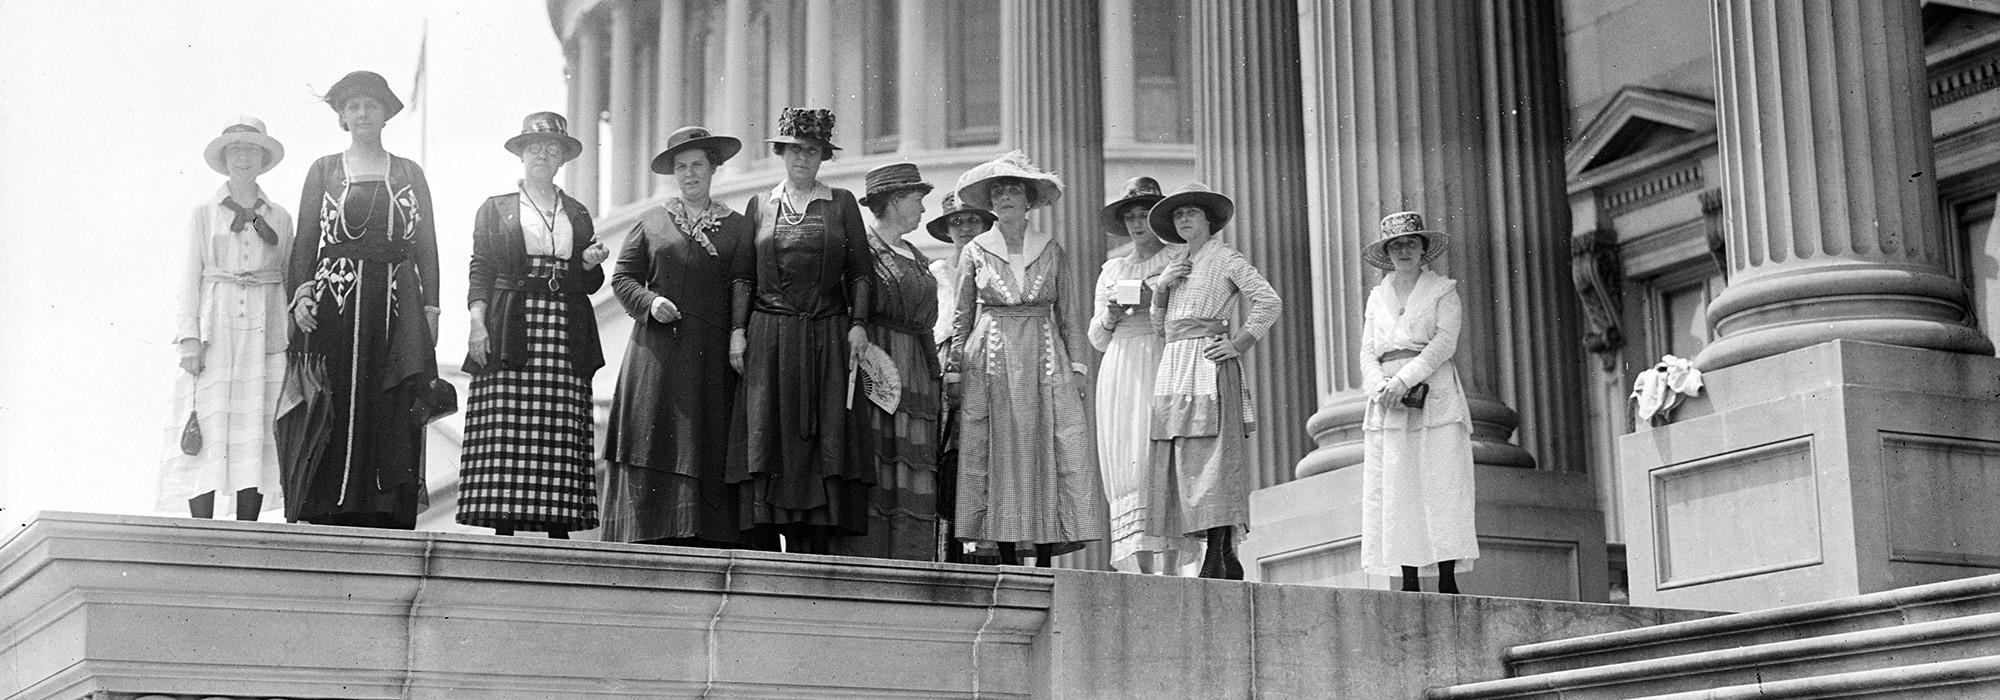 suffragettesCapitol-hero.jpg